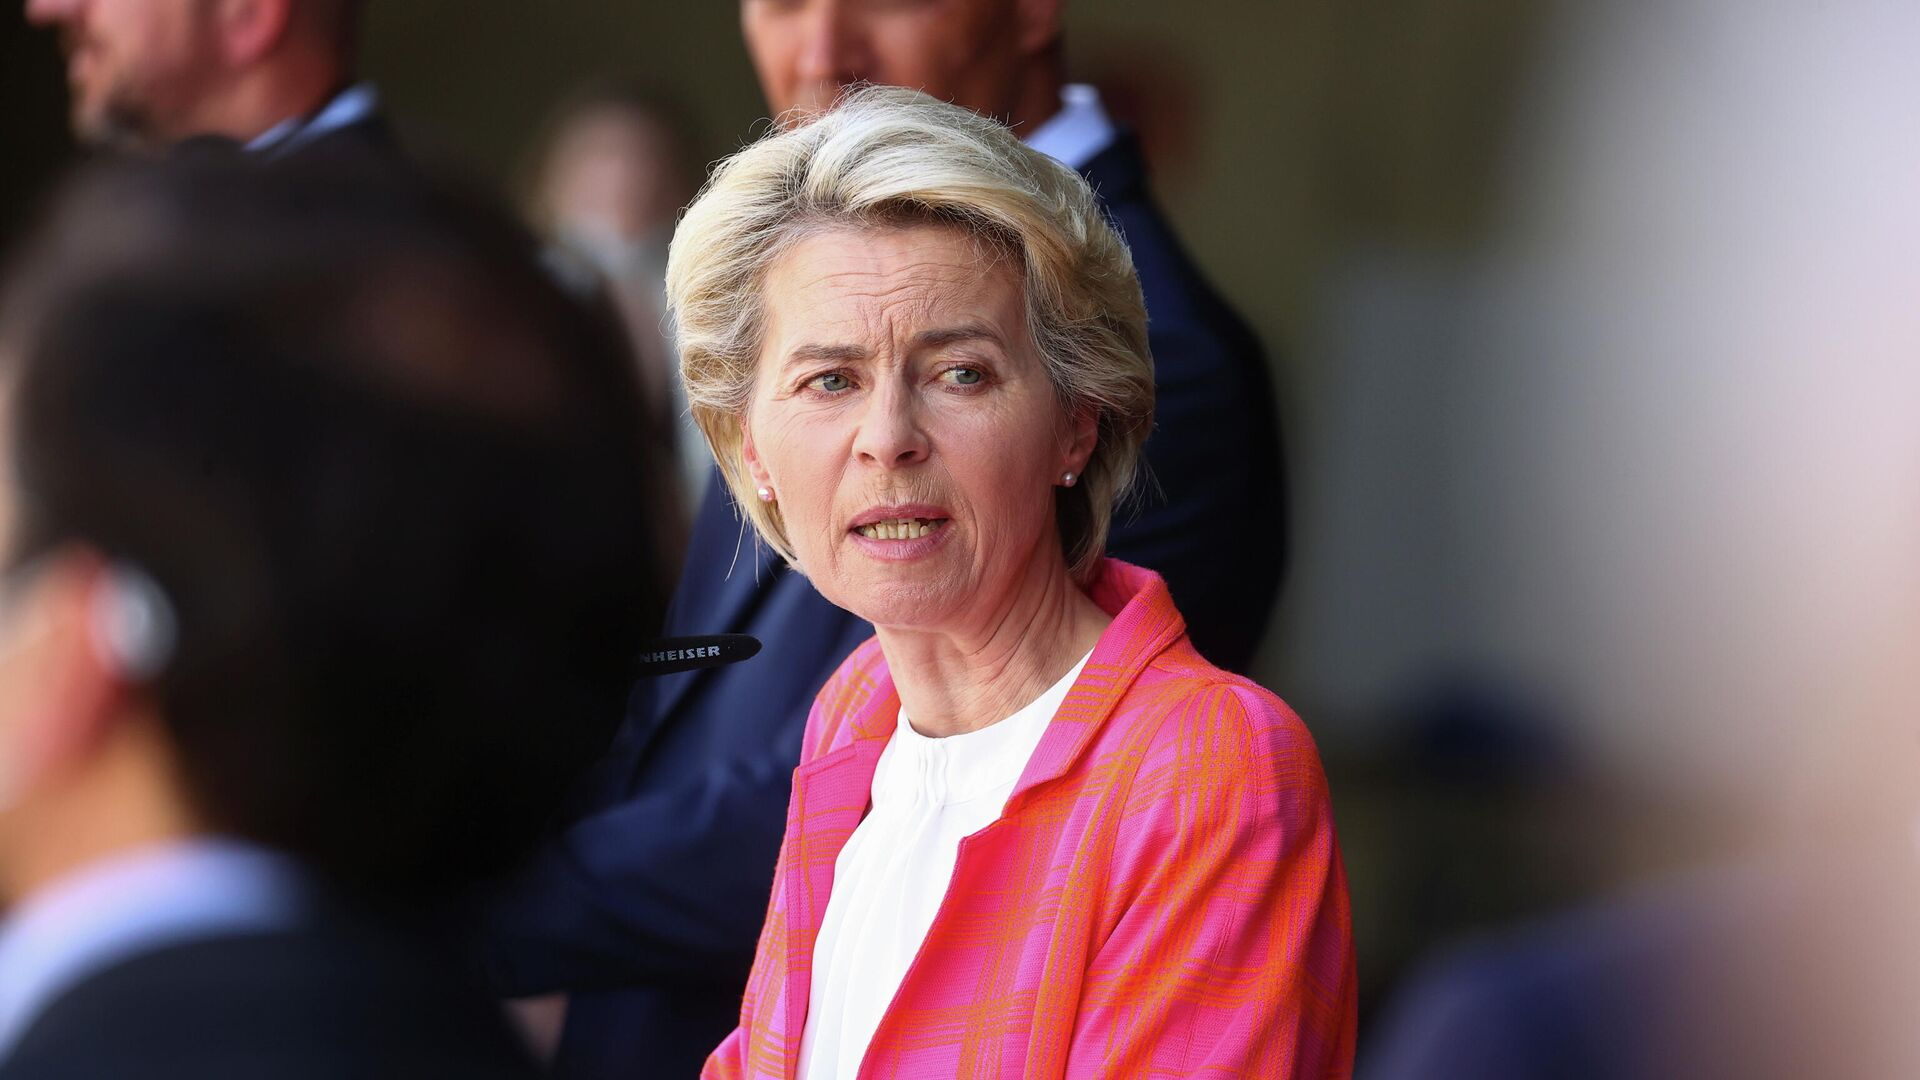 Ursula Von der Leyen, presidenta de la Comisión Europea - Sputnik Mundo, 1920, 21.08.2021